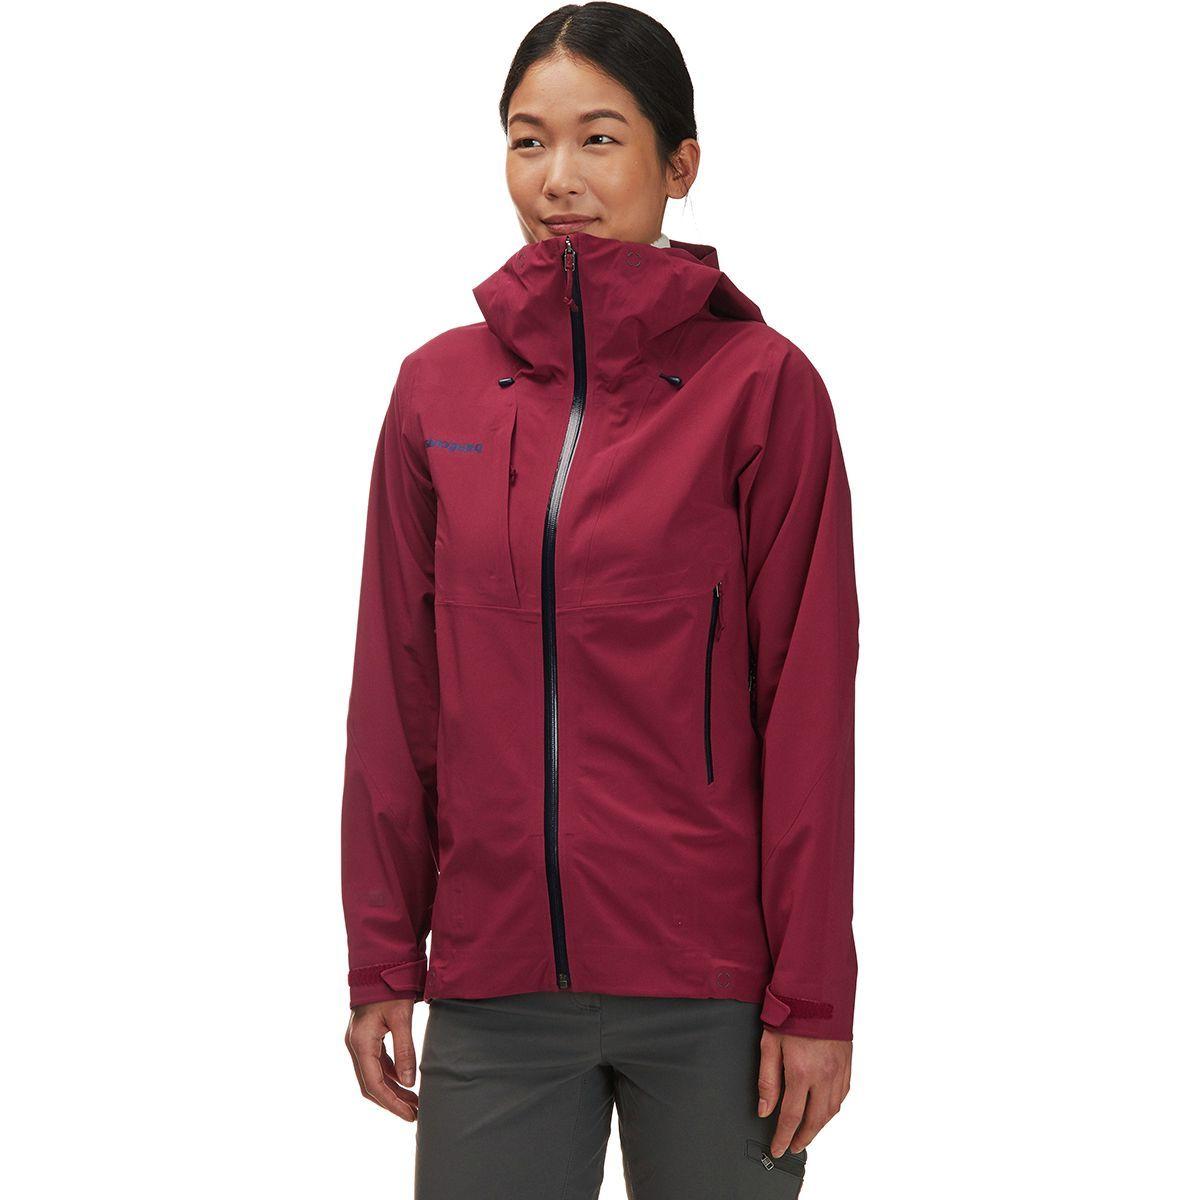 Patagonia Galvanized Jacket - Women's